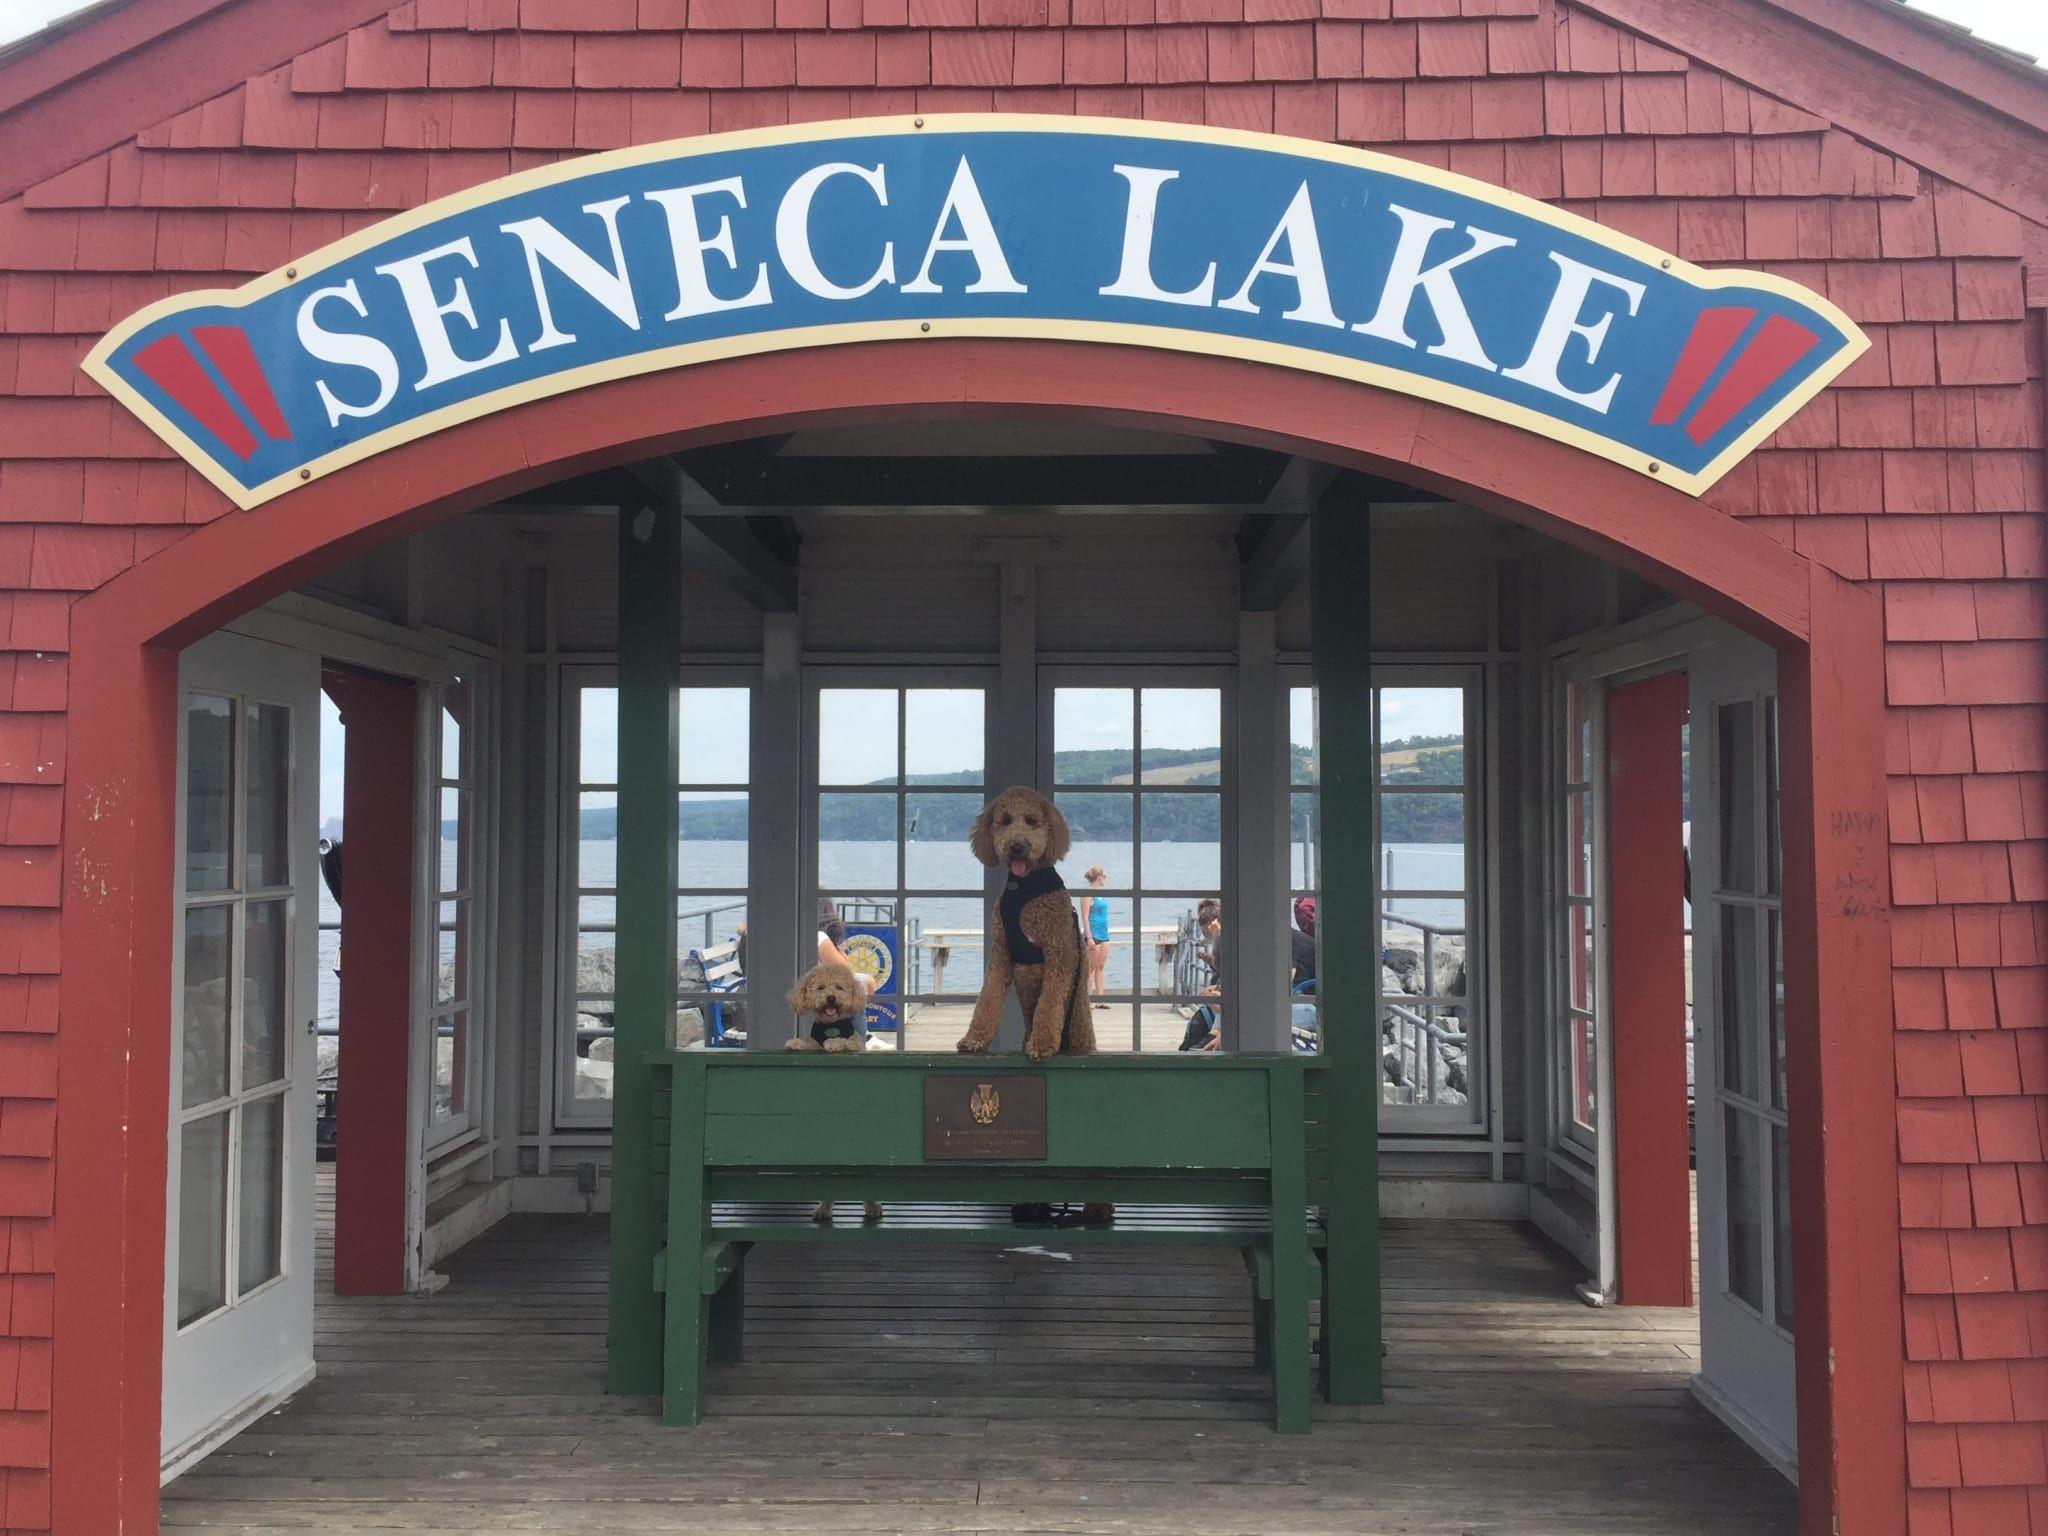 seneca lake boat rentals ny